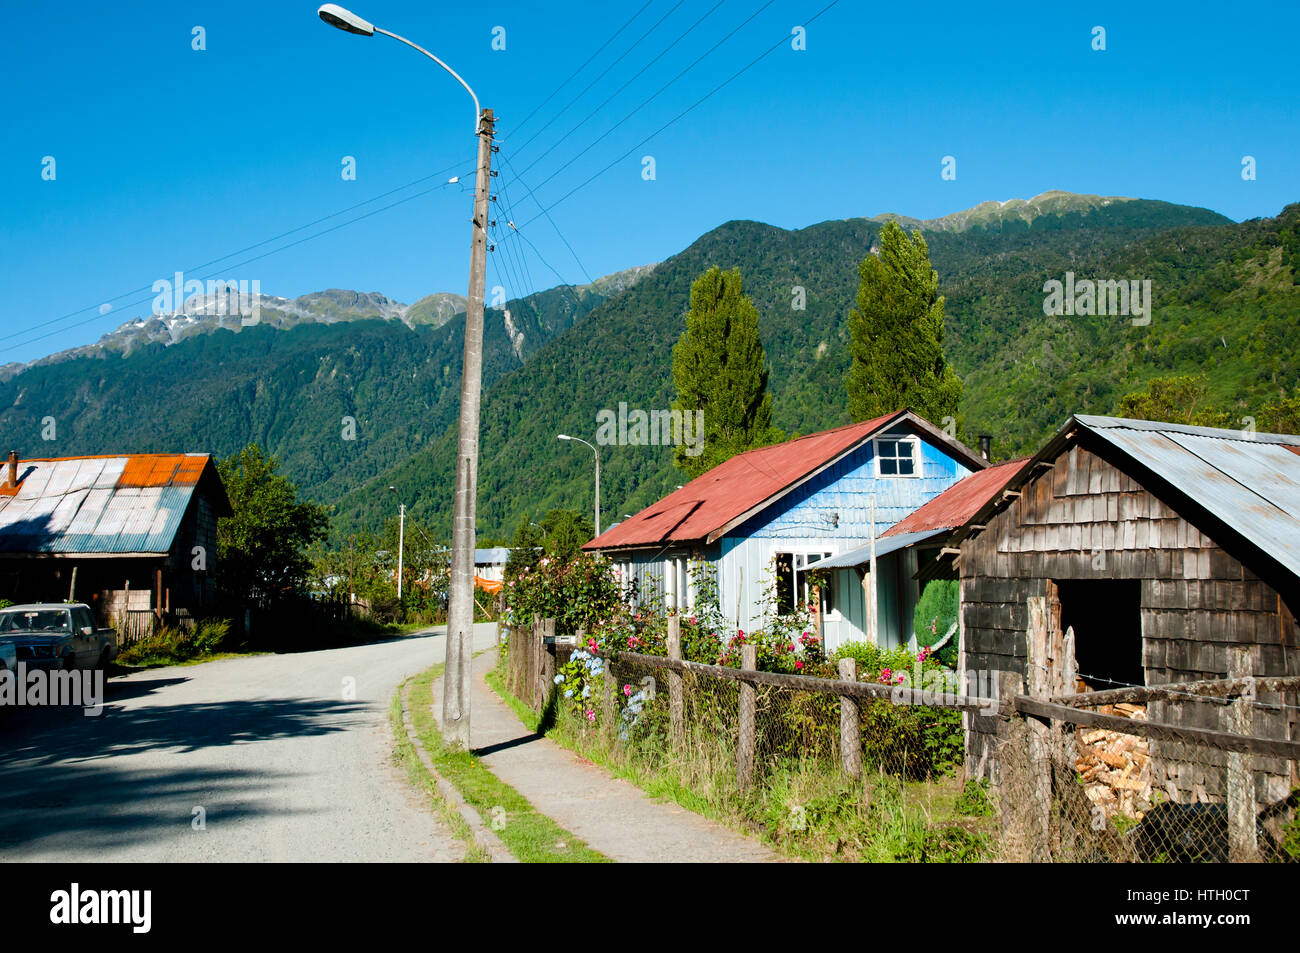 Puyuhuapi Town - Chile - Stock Image